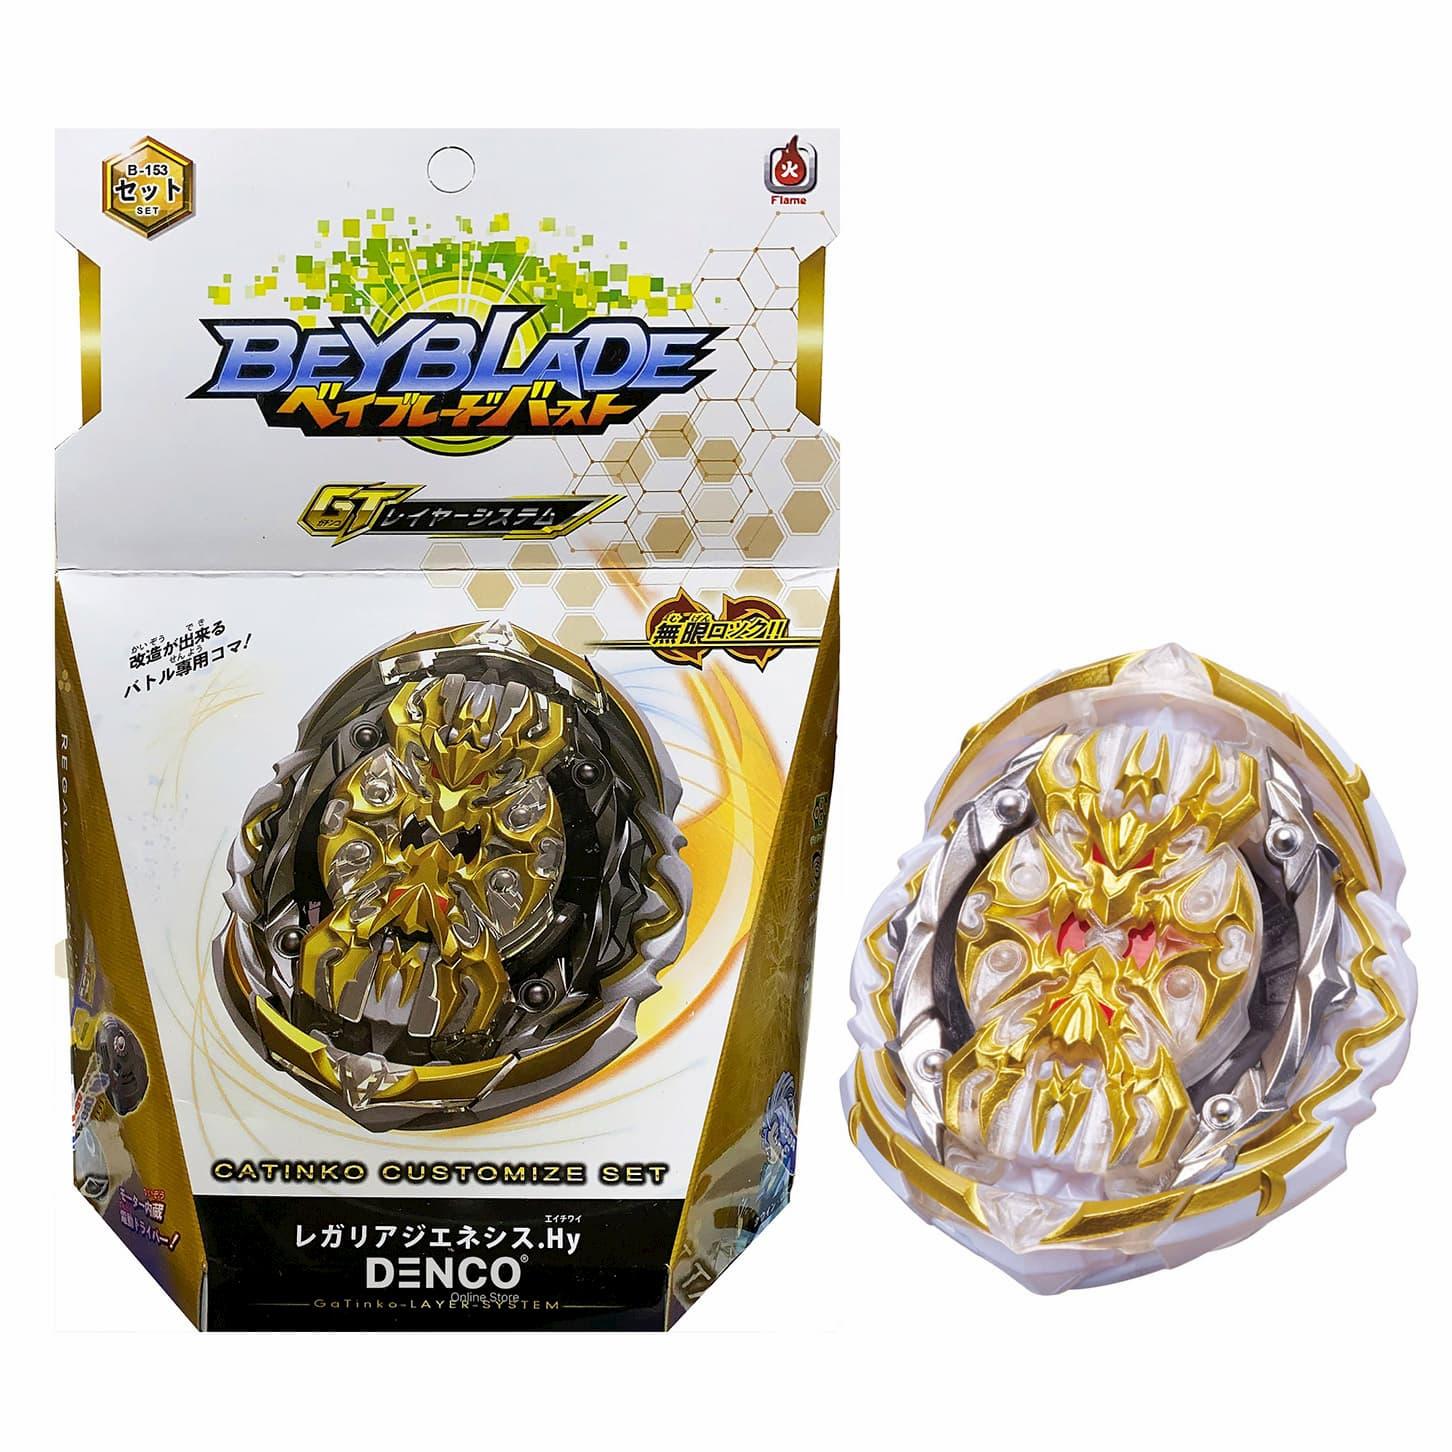 Волчок BEYBLADE Burst Регалия Генезис (Regalia Genesis) B-153-01 от SB/Flame с Запускателем